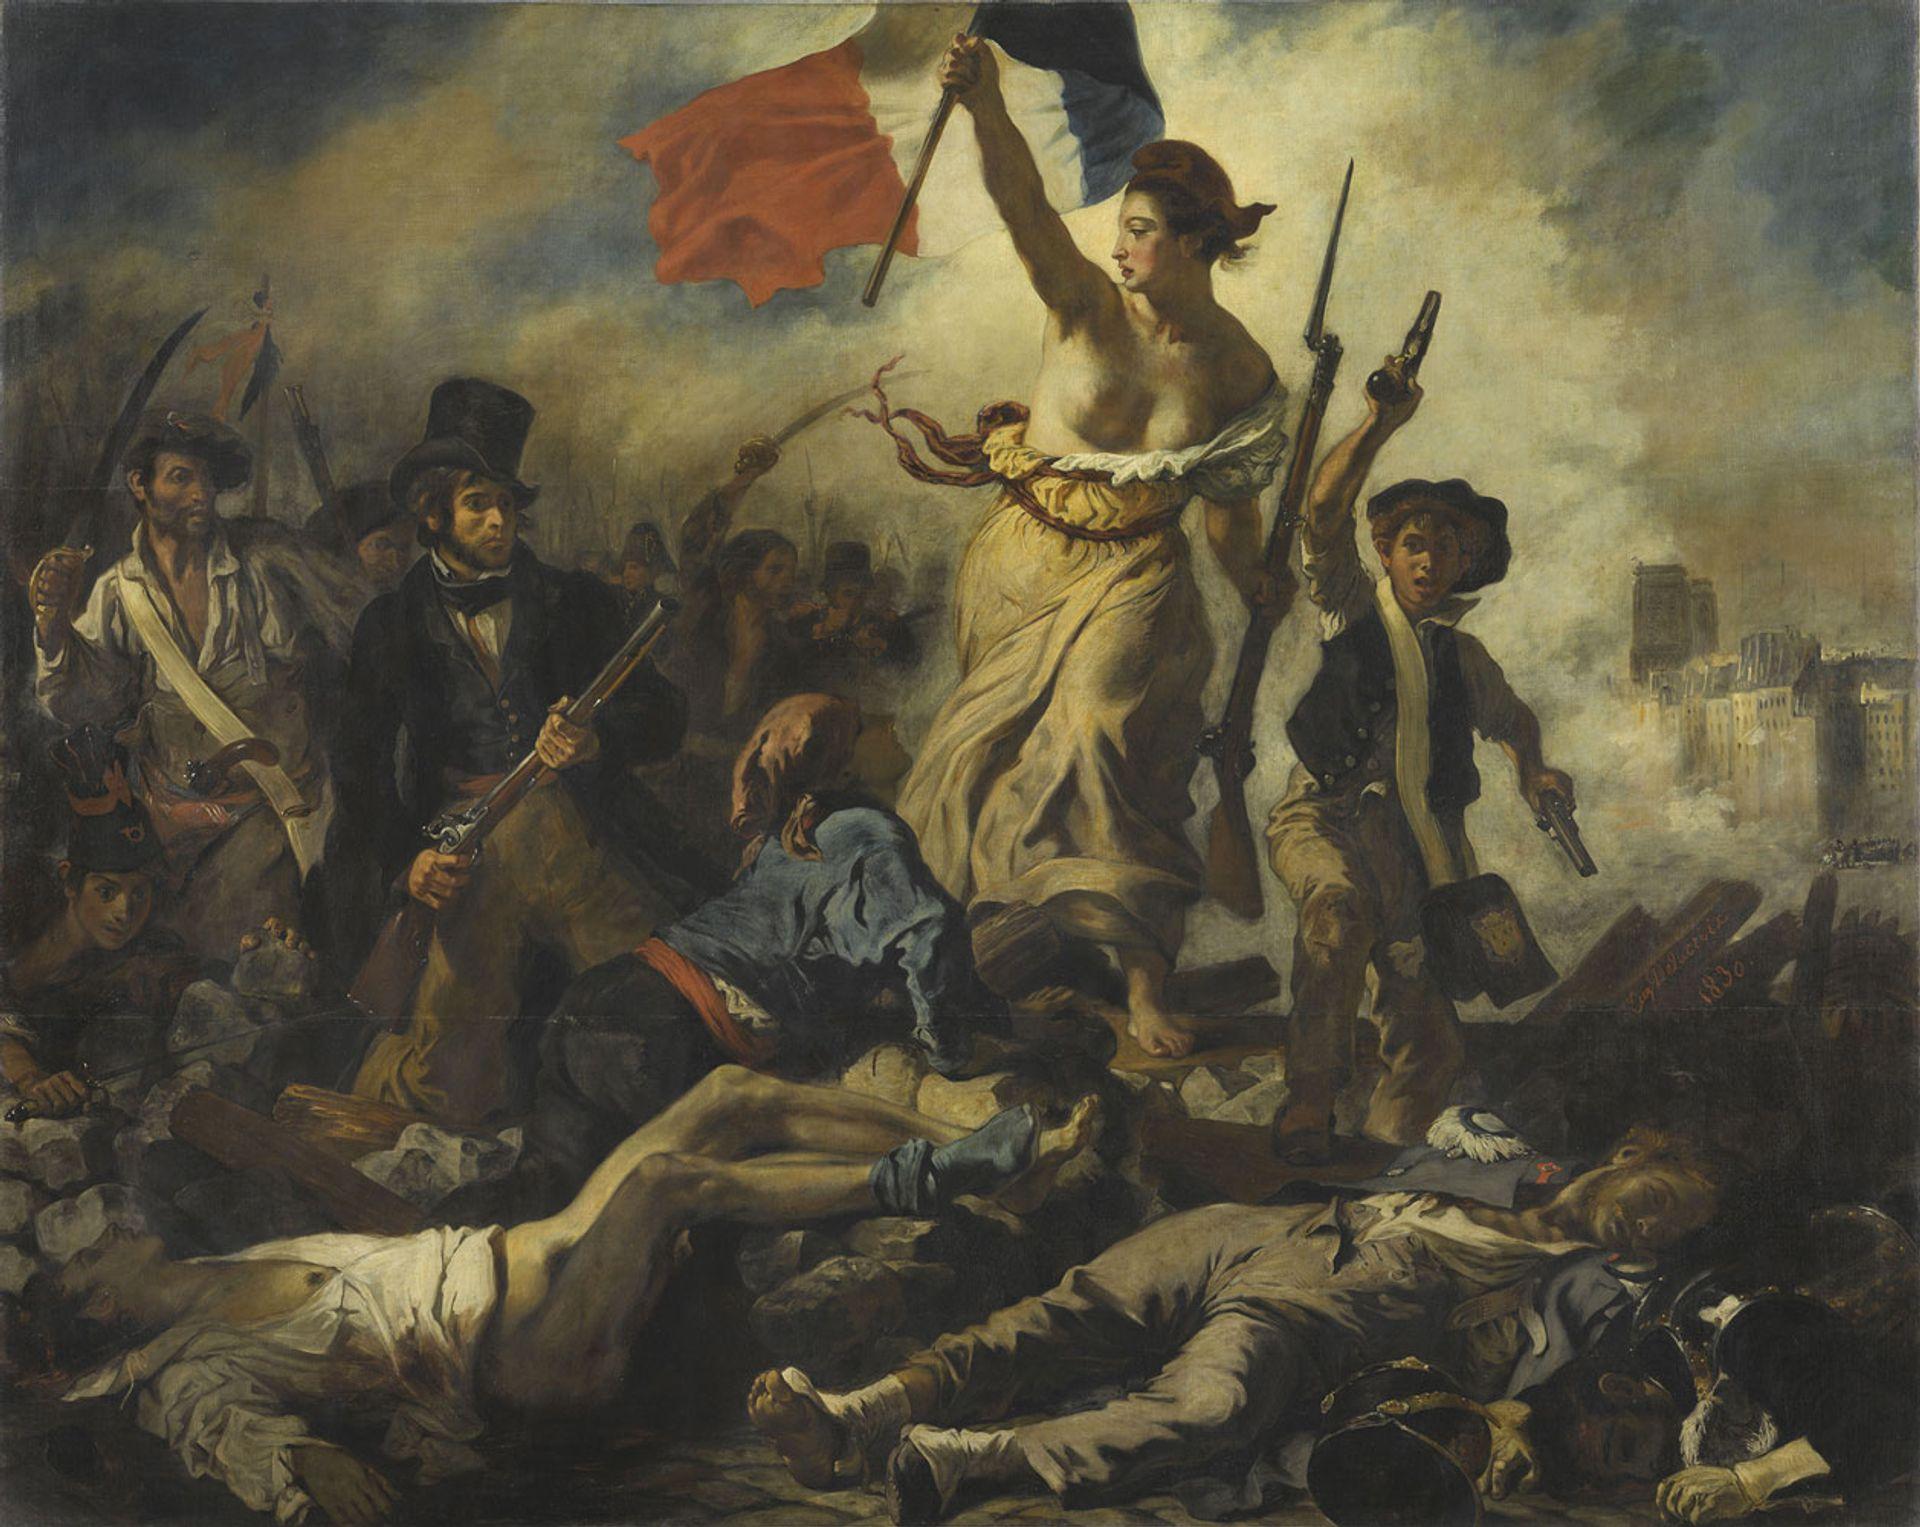 Eugène Delacroix's Liberty Leading the People (1830) Michel Urtado